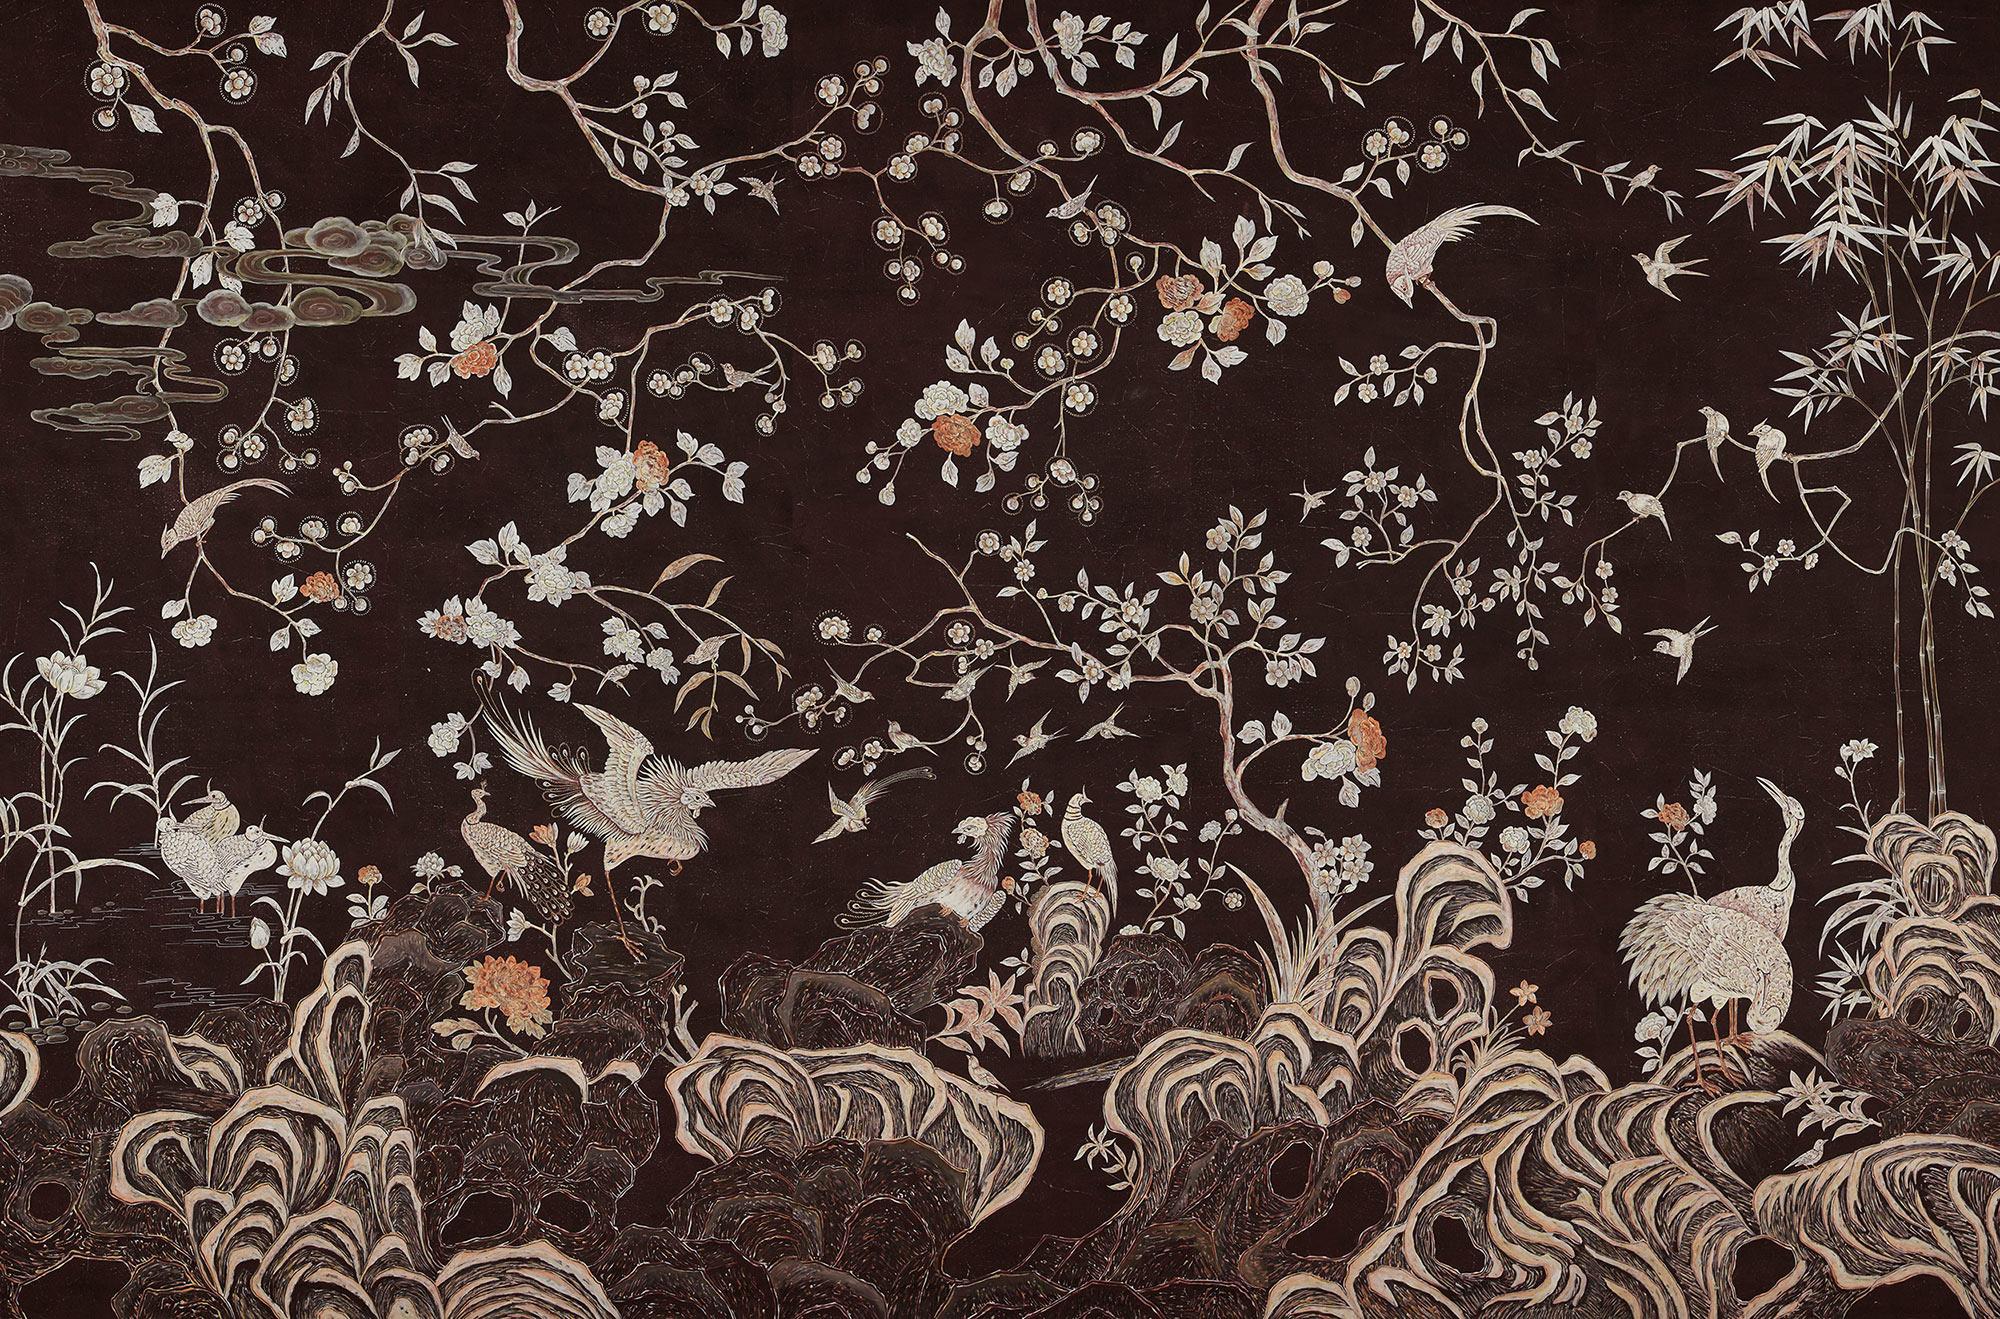 Standard on Edo Burnt Umber painted Xuan paper